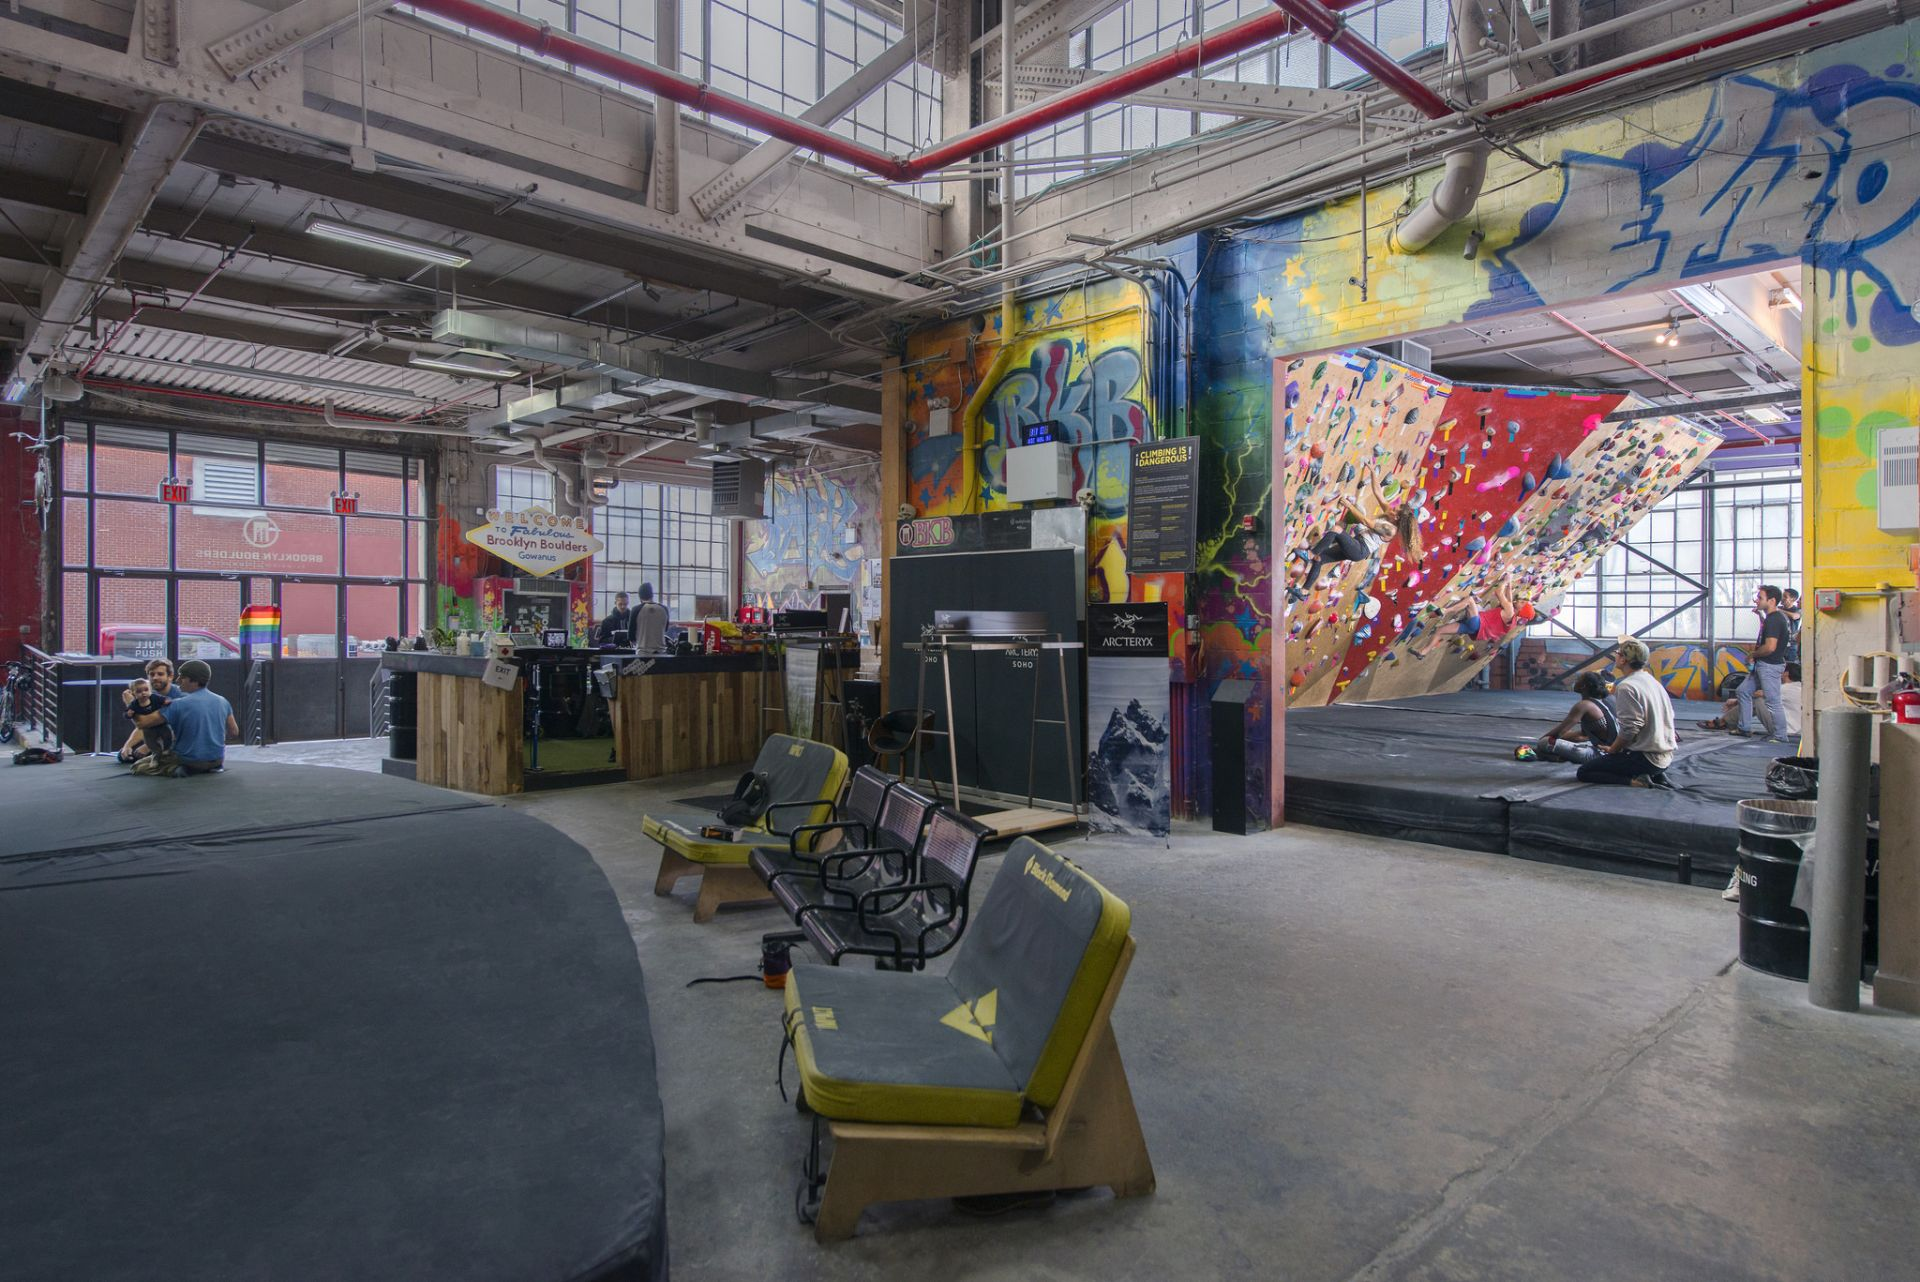 Brooklyn Boulders Gowanus, NYC